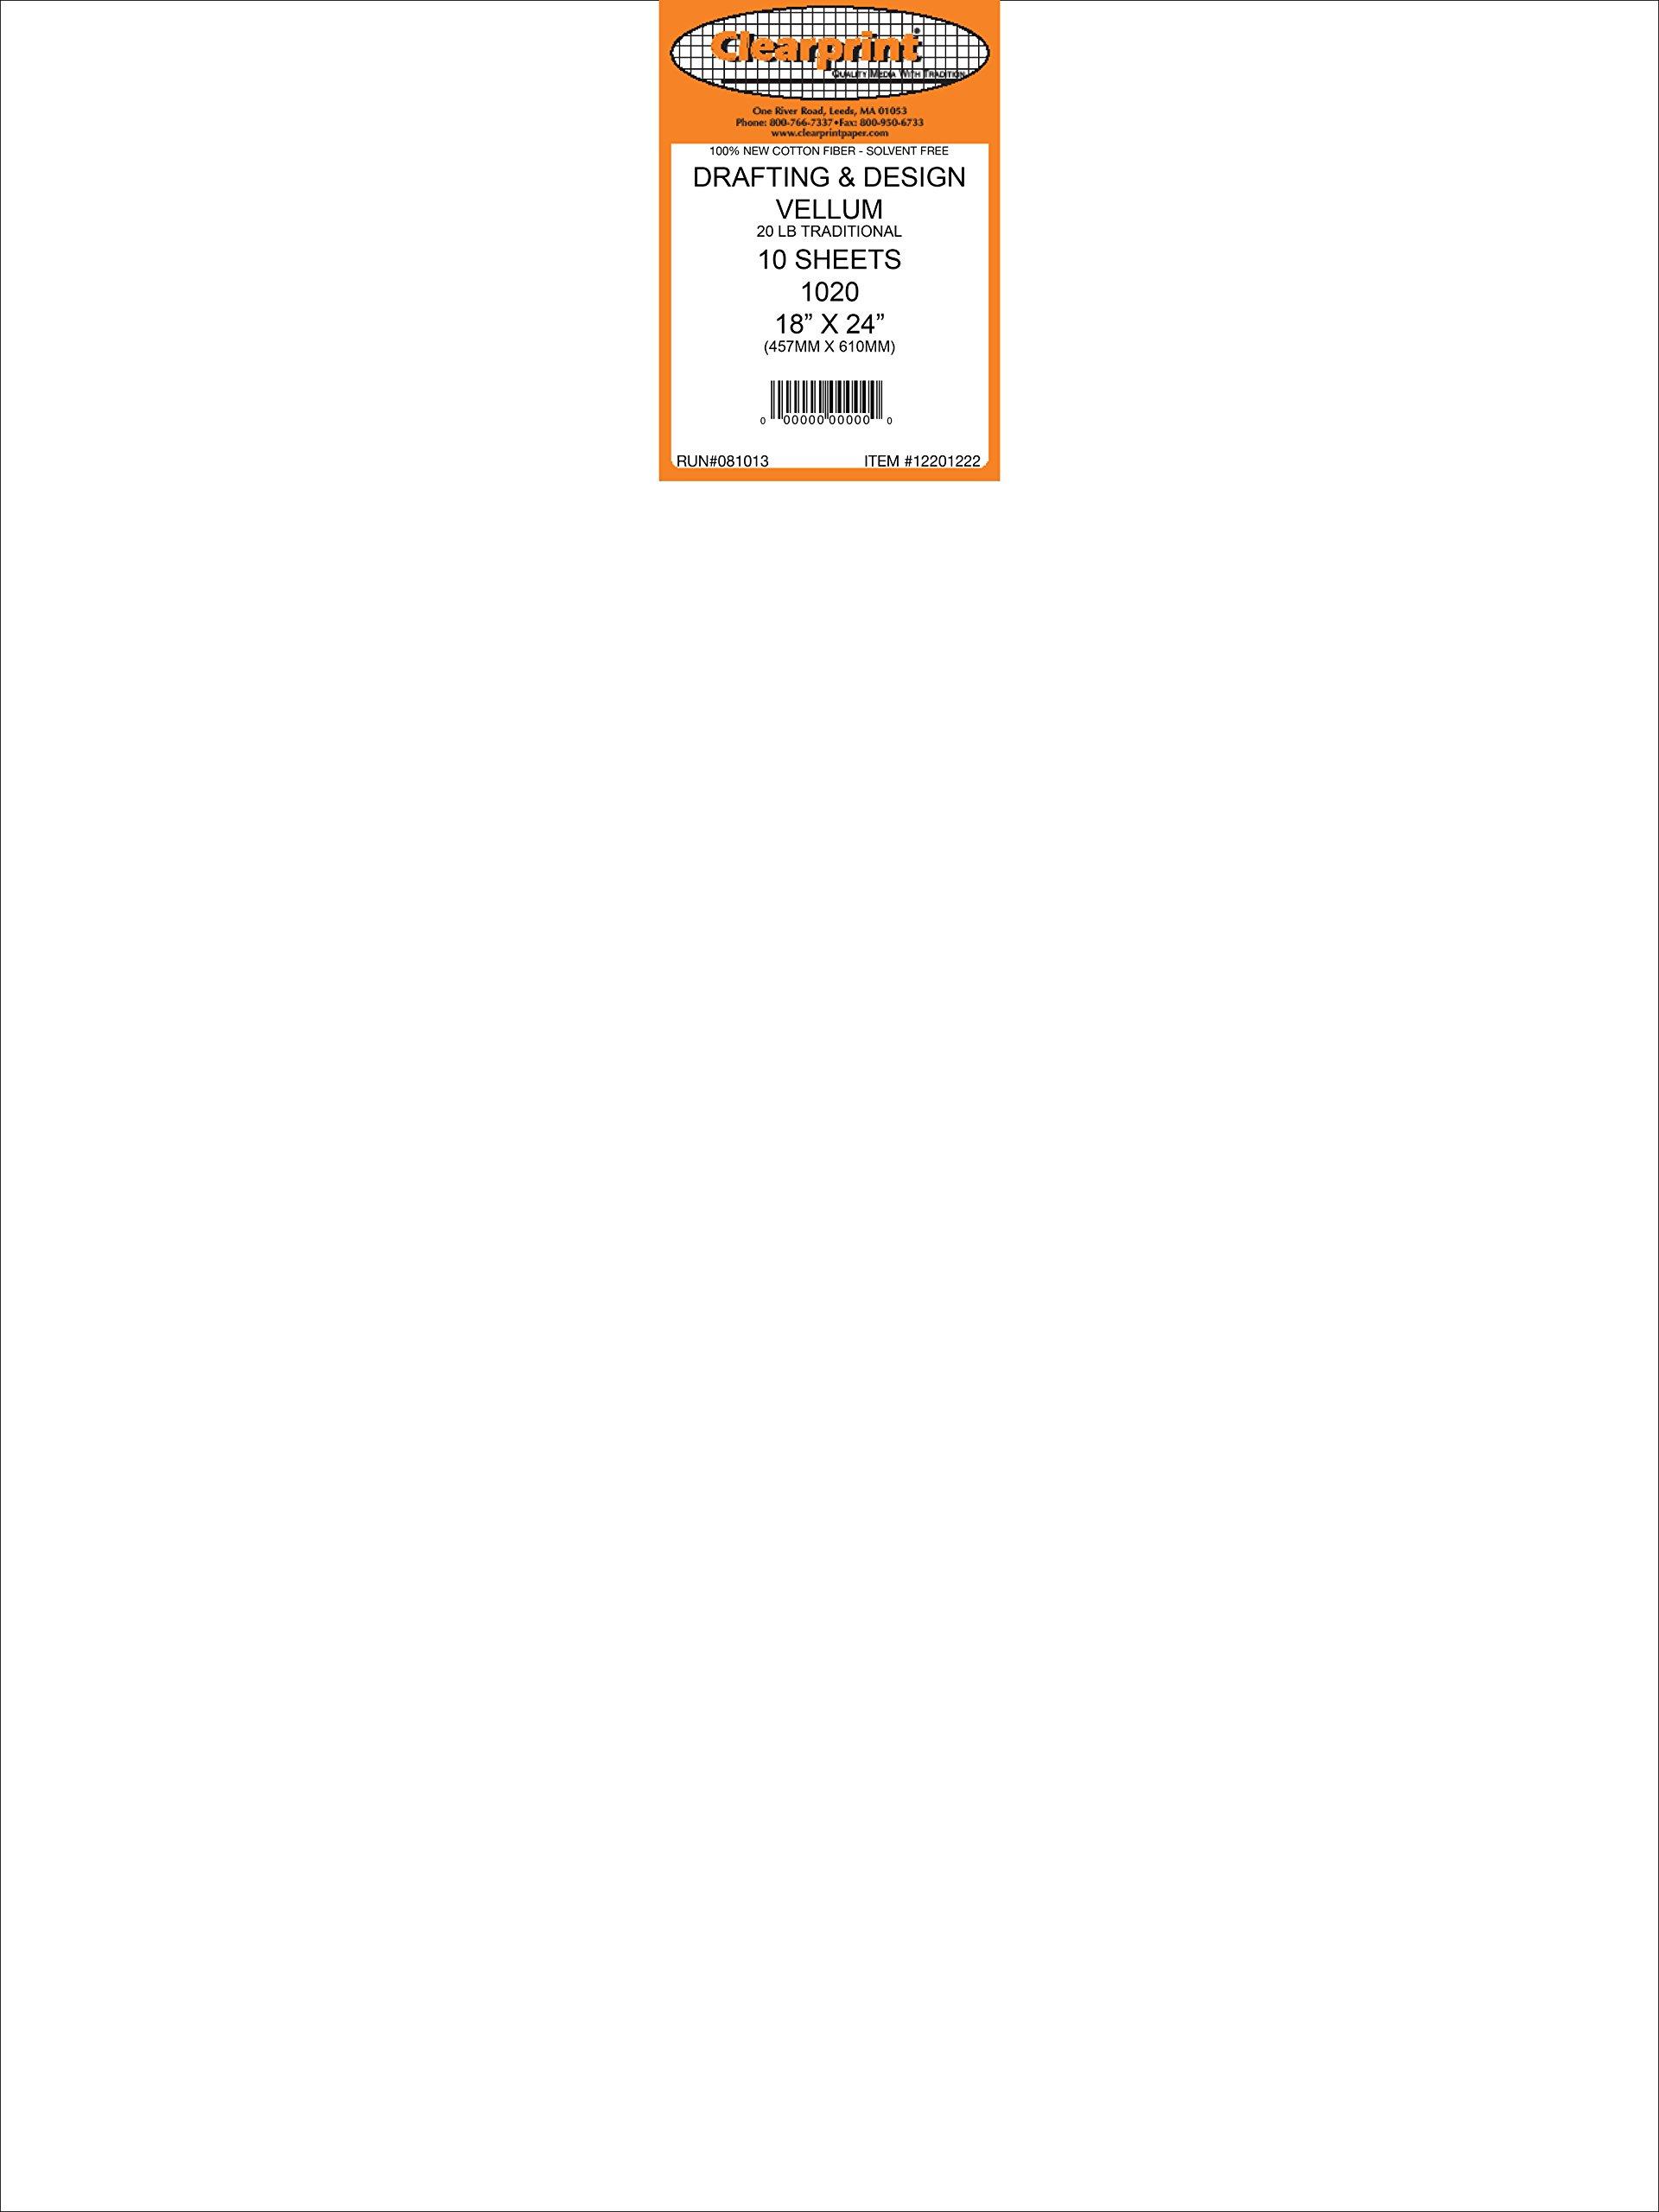 Clearprint 1020H Design Vellum Sheets, 20 lb, 100% Cotton, 18 x 24 Inches, 10 Sheets Per Pack, Translucent White, 1 Each (12201222)